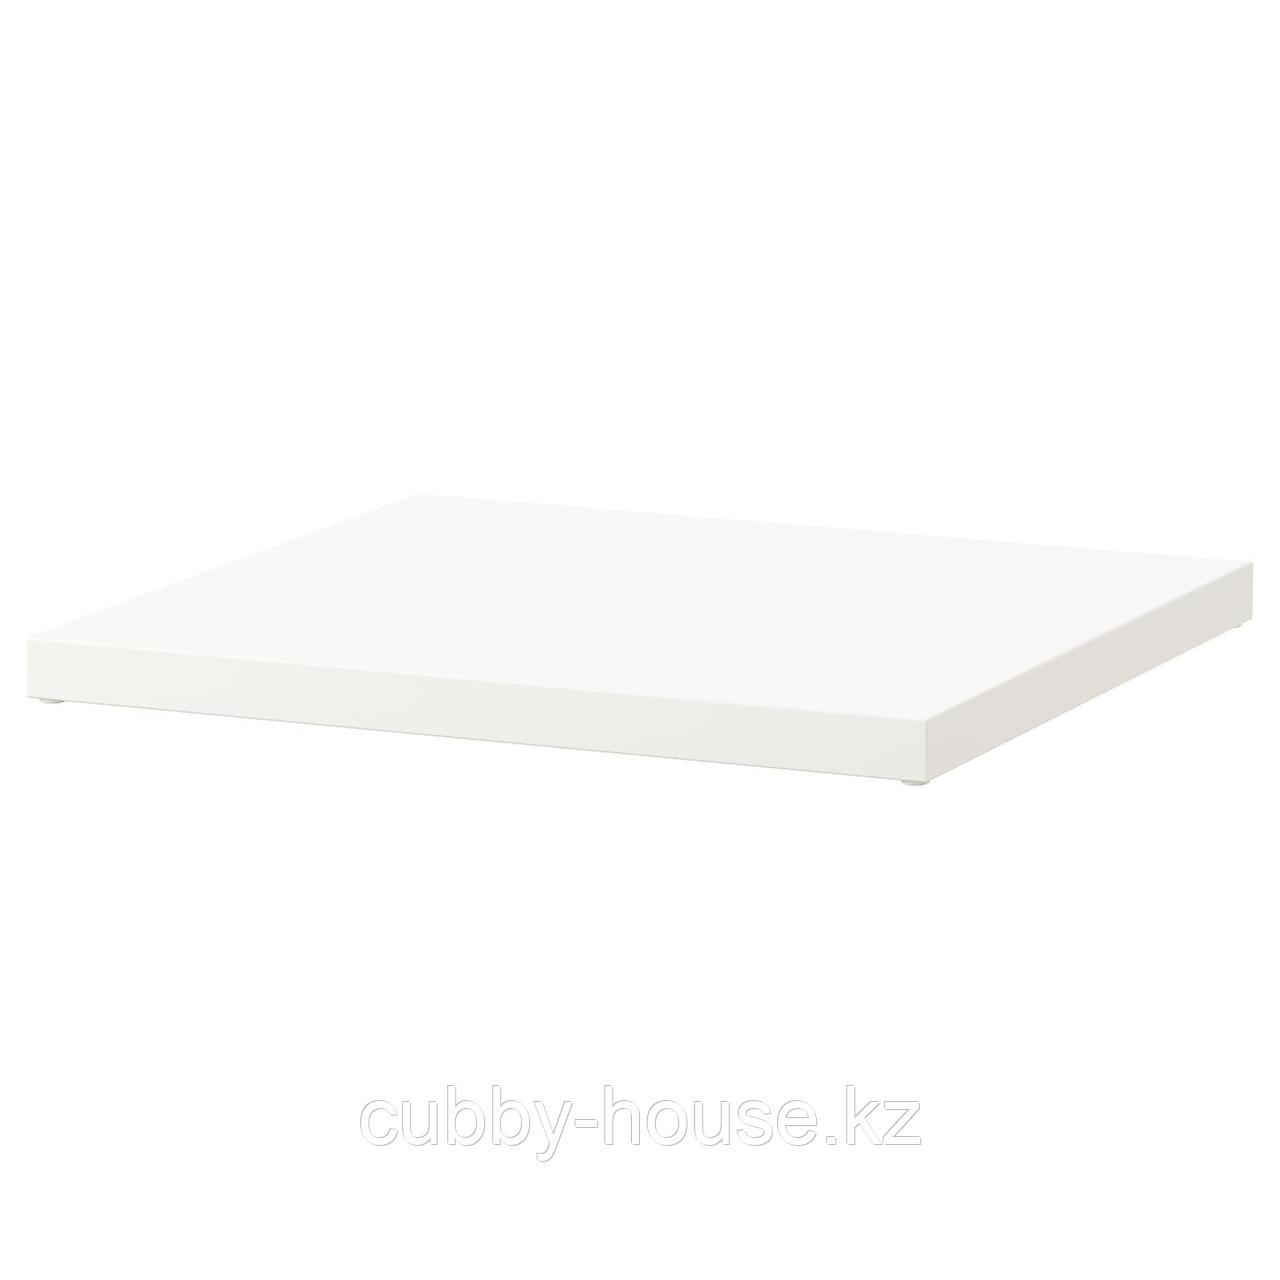 ЭЛВАРЛИ Полка, белый, 40x51 см